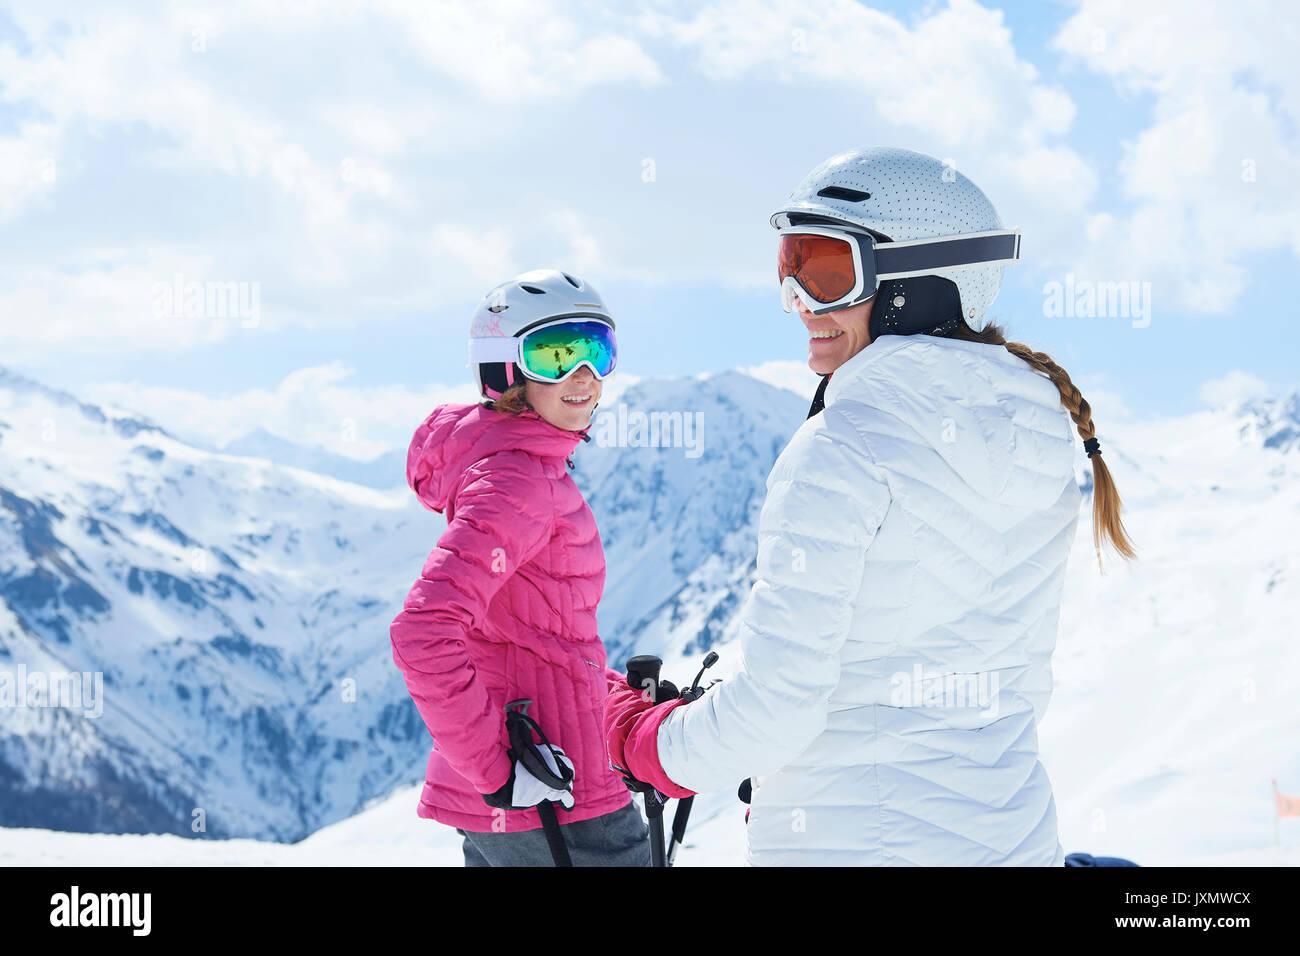 Madre e hija en el esquí vacaciones, Mijdrecht, Tirol, Austria Imagen De Stock